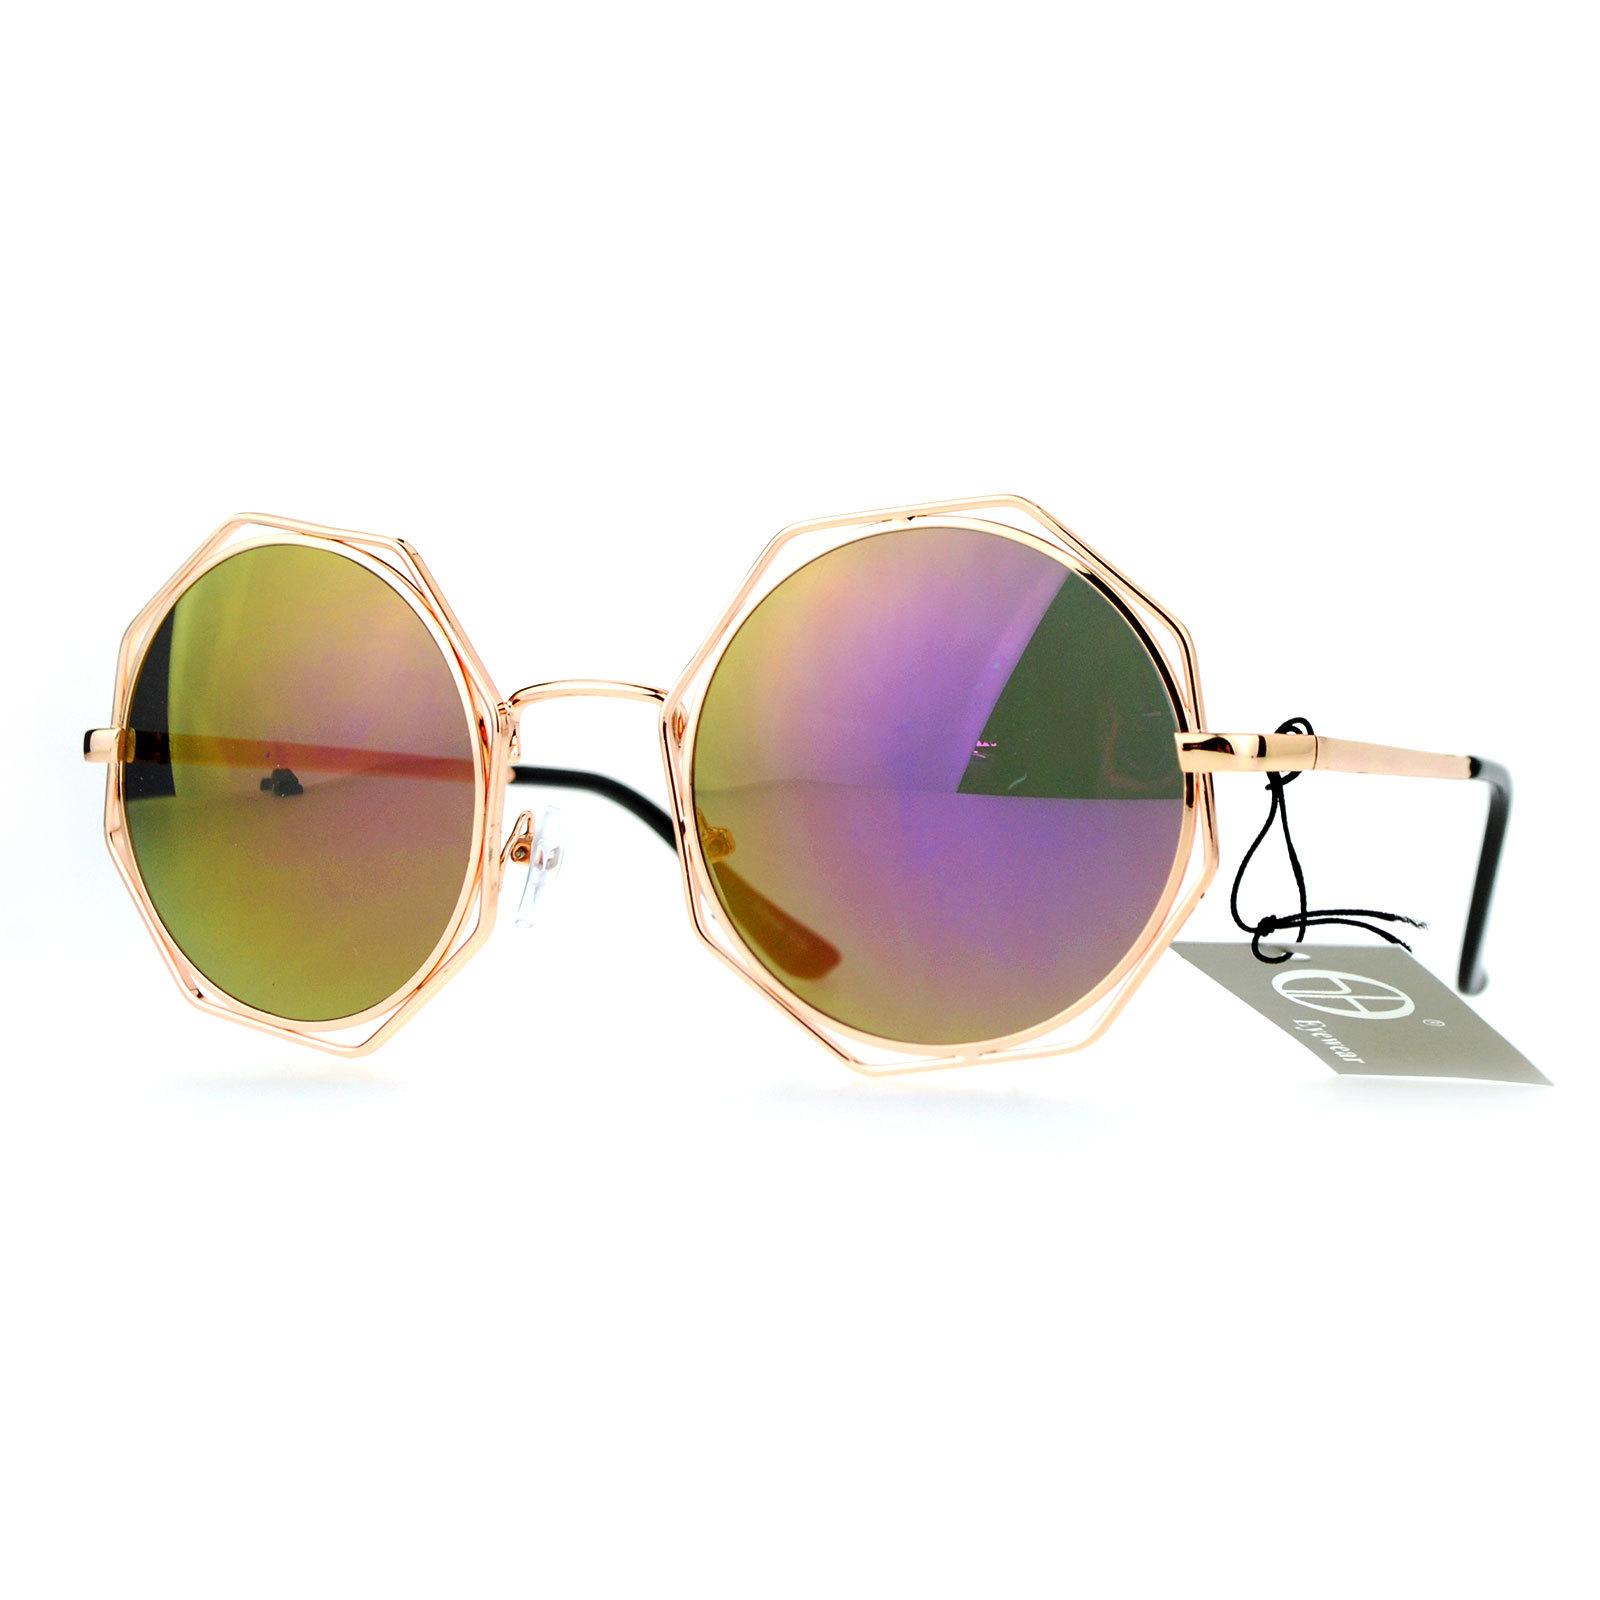 SA106 Octagonal Double Rim Circle Lens Womens Sunglasses Silver Blue